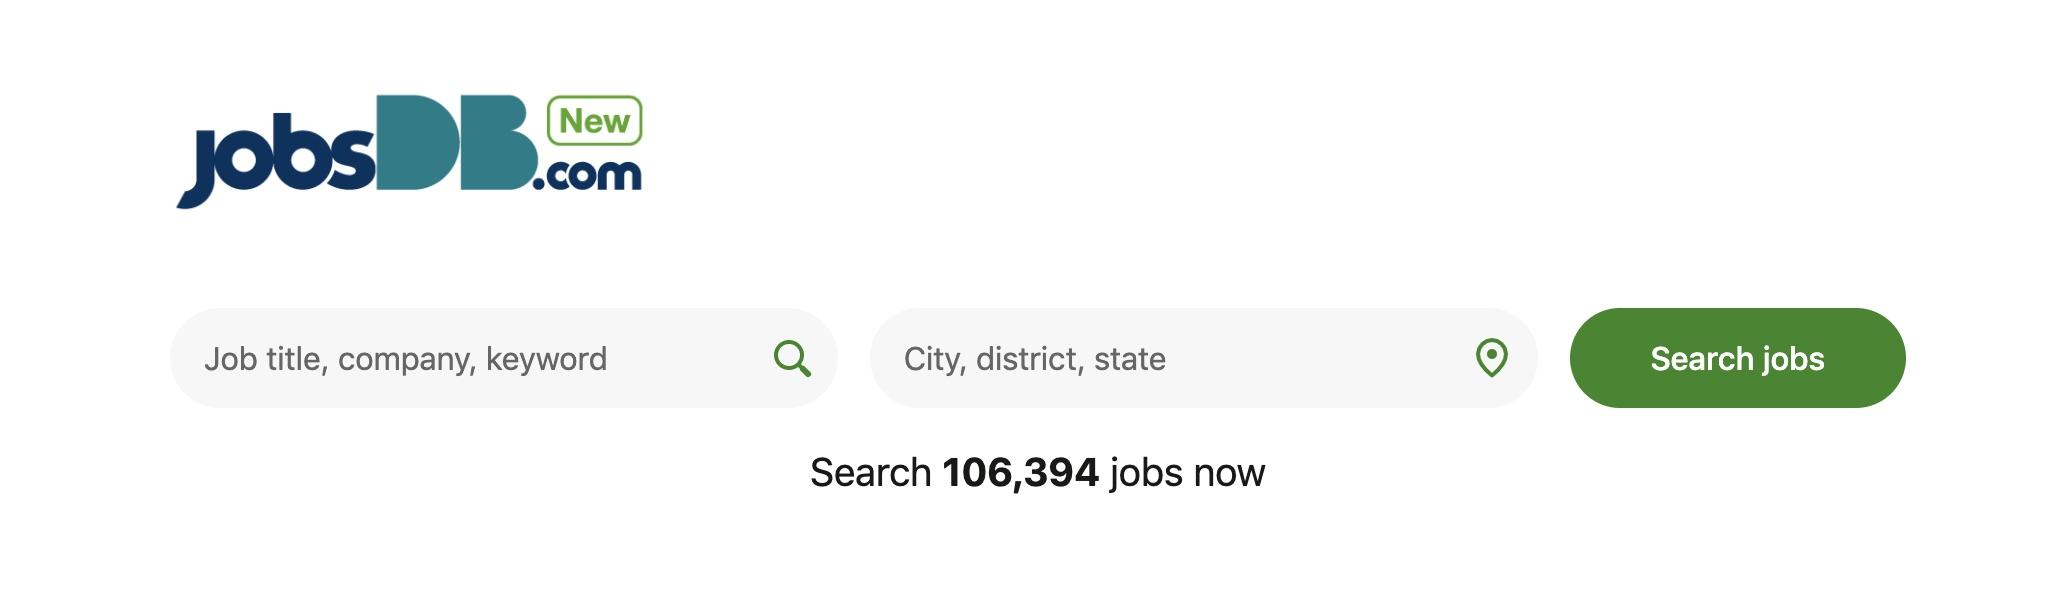 JobsDB Singapore